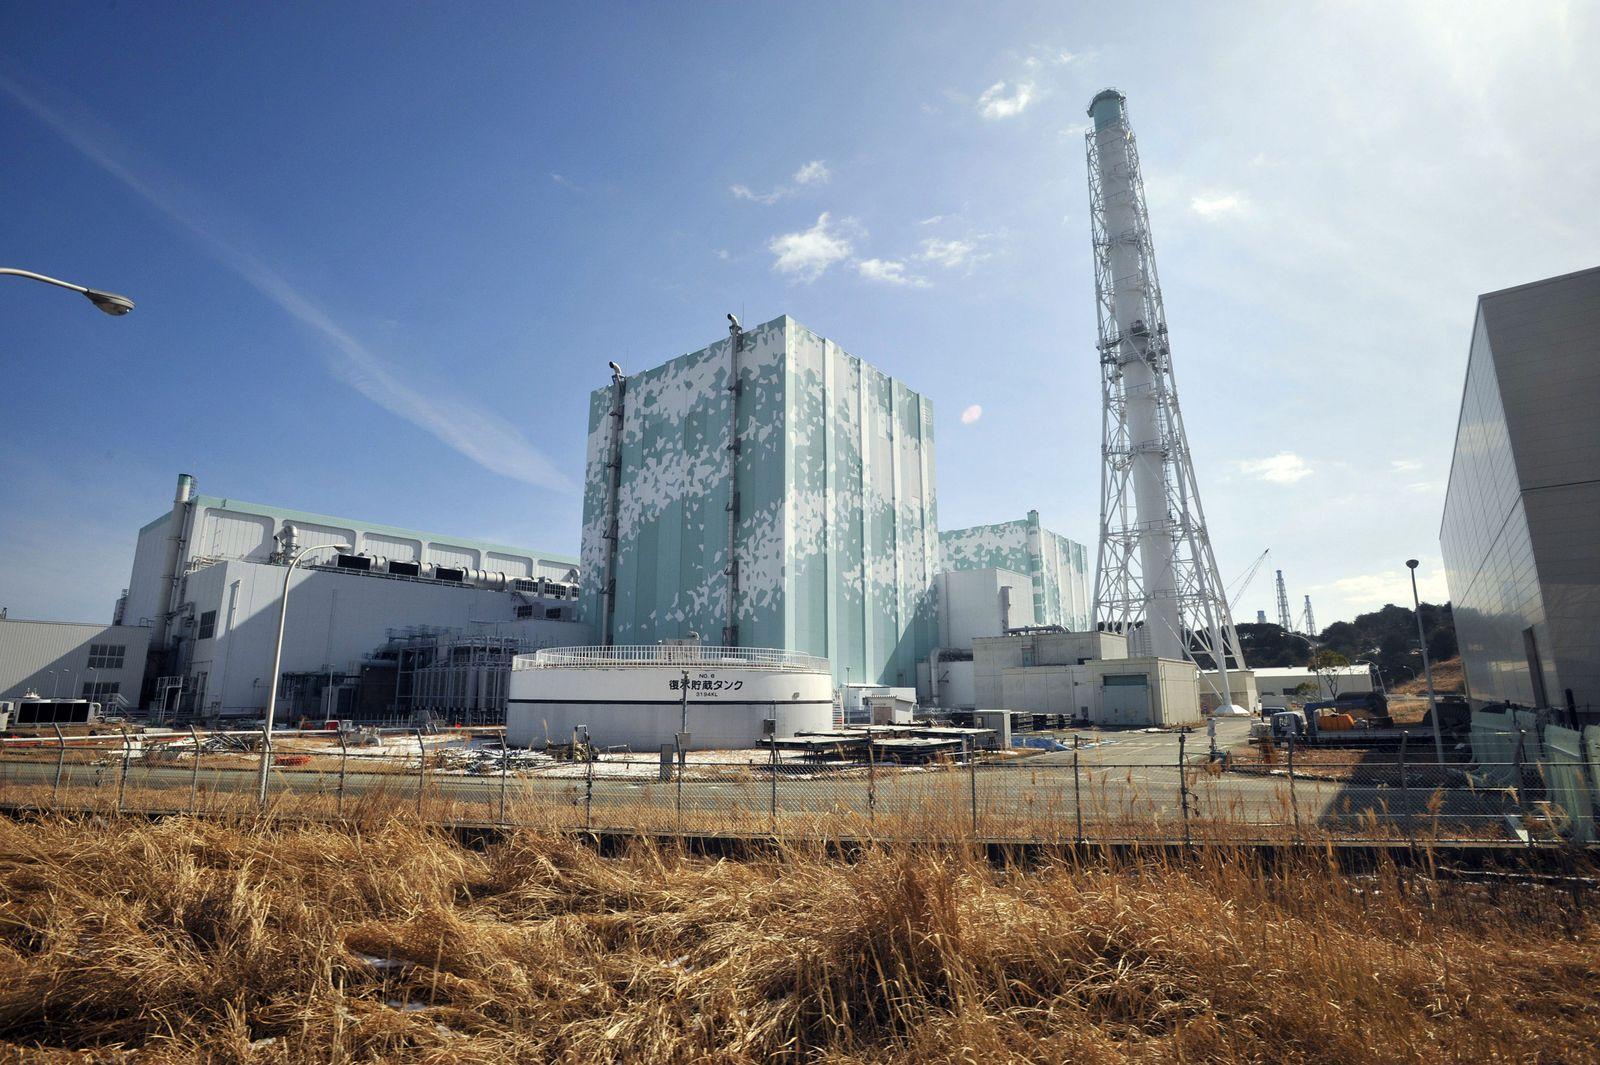 Fukushima / Reaktor 5 und 6